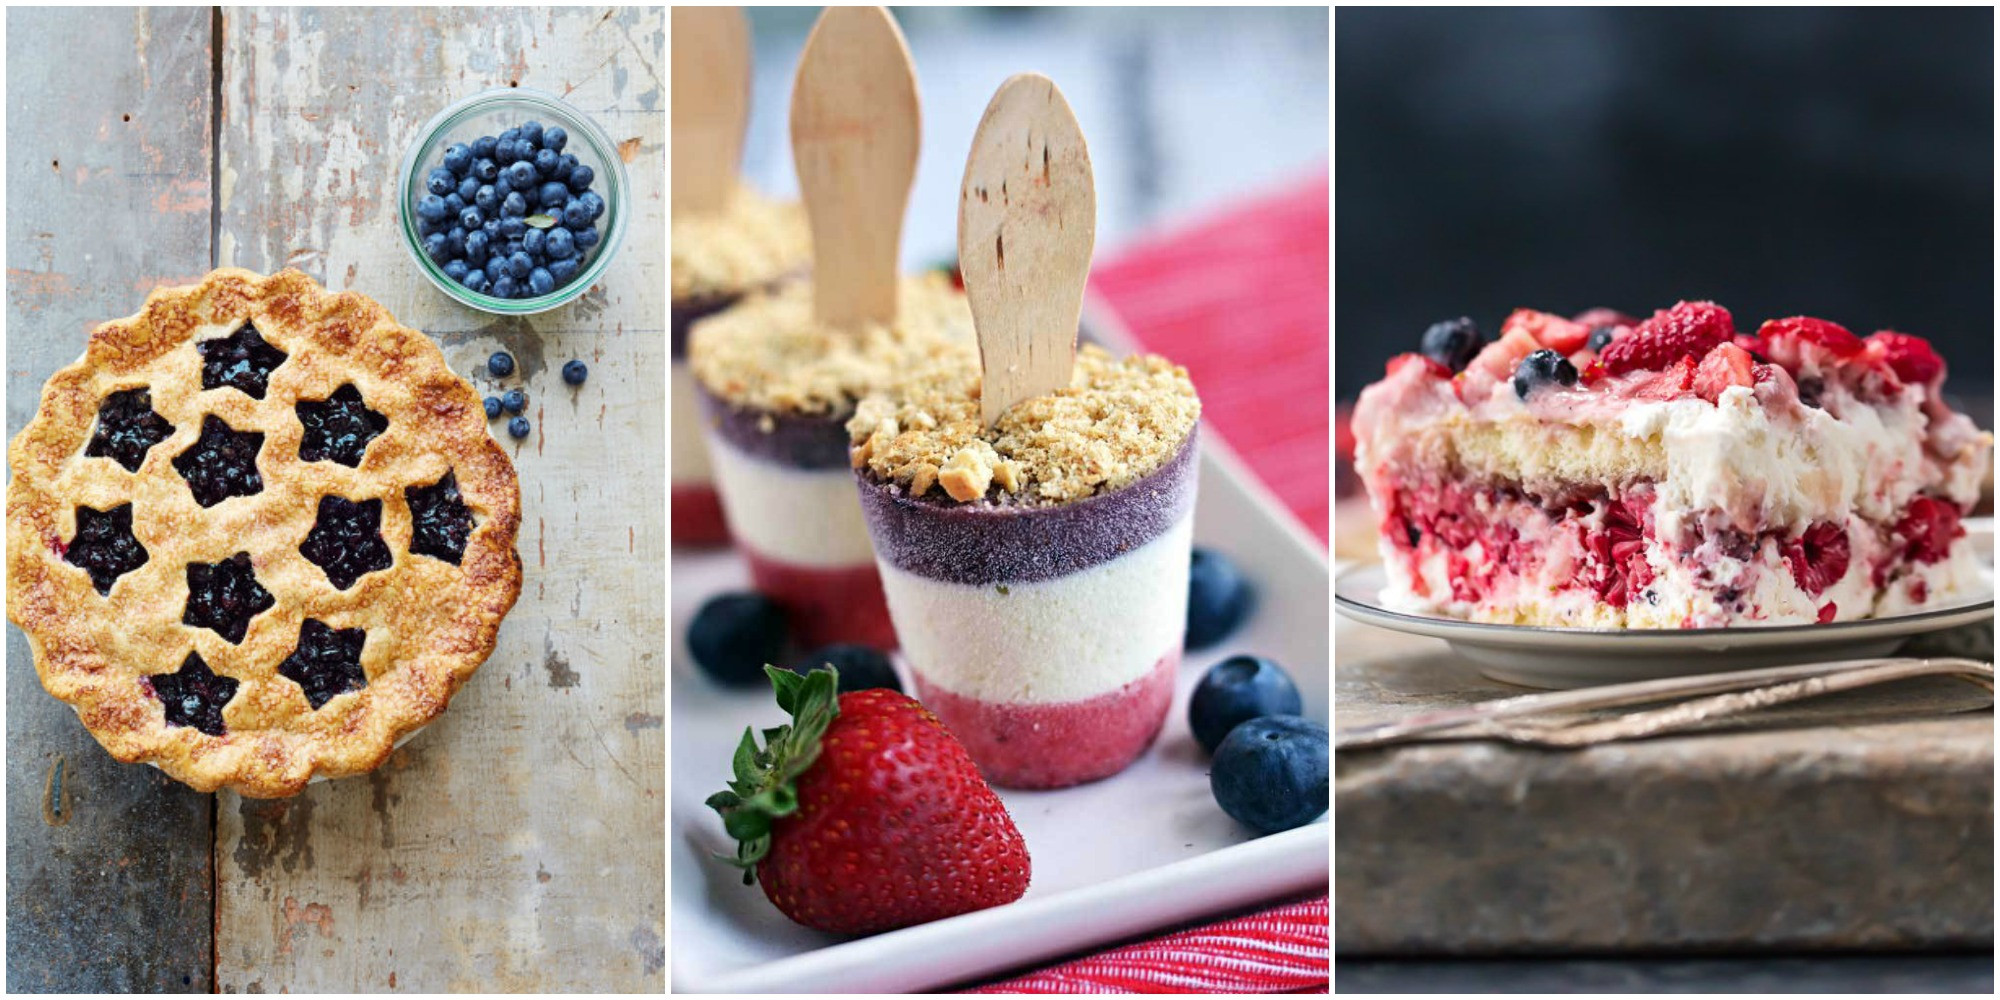 Memorial Day Dessert Recipe  20 Memorial Day Desserts Treats for a Memorial Day Party